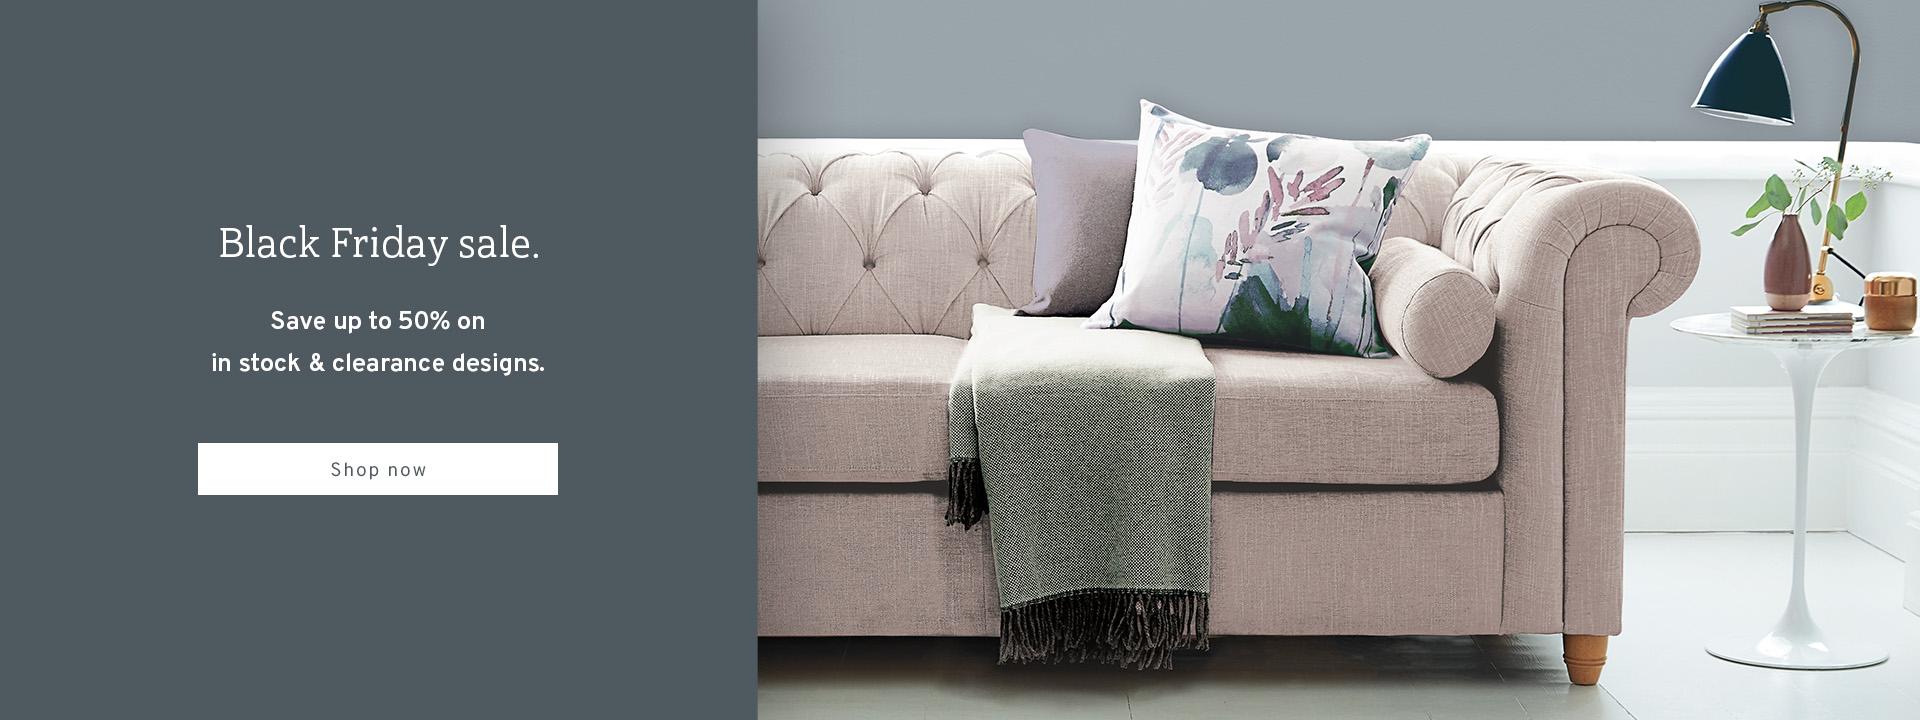 Surprising Handmade Luxury British Sofas Sofa Beds Willow Hall Andrewgaddart Wooden Chair Designs For Living Room Andrewgaddartcom